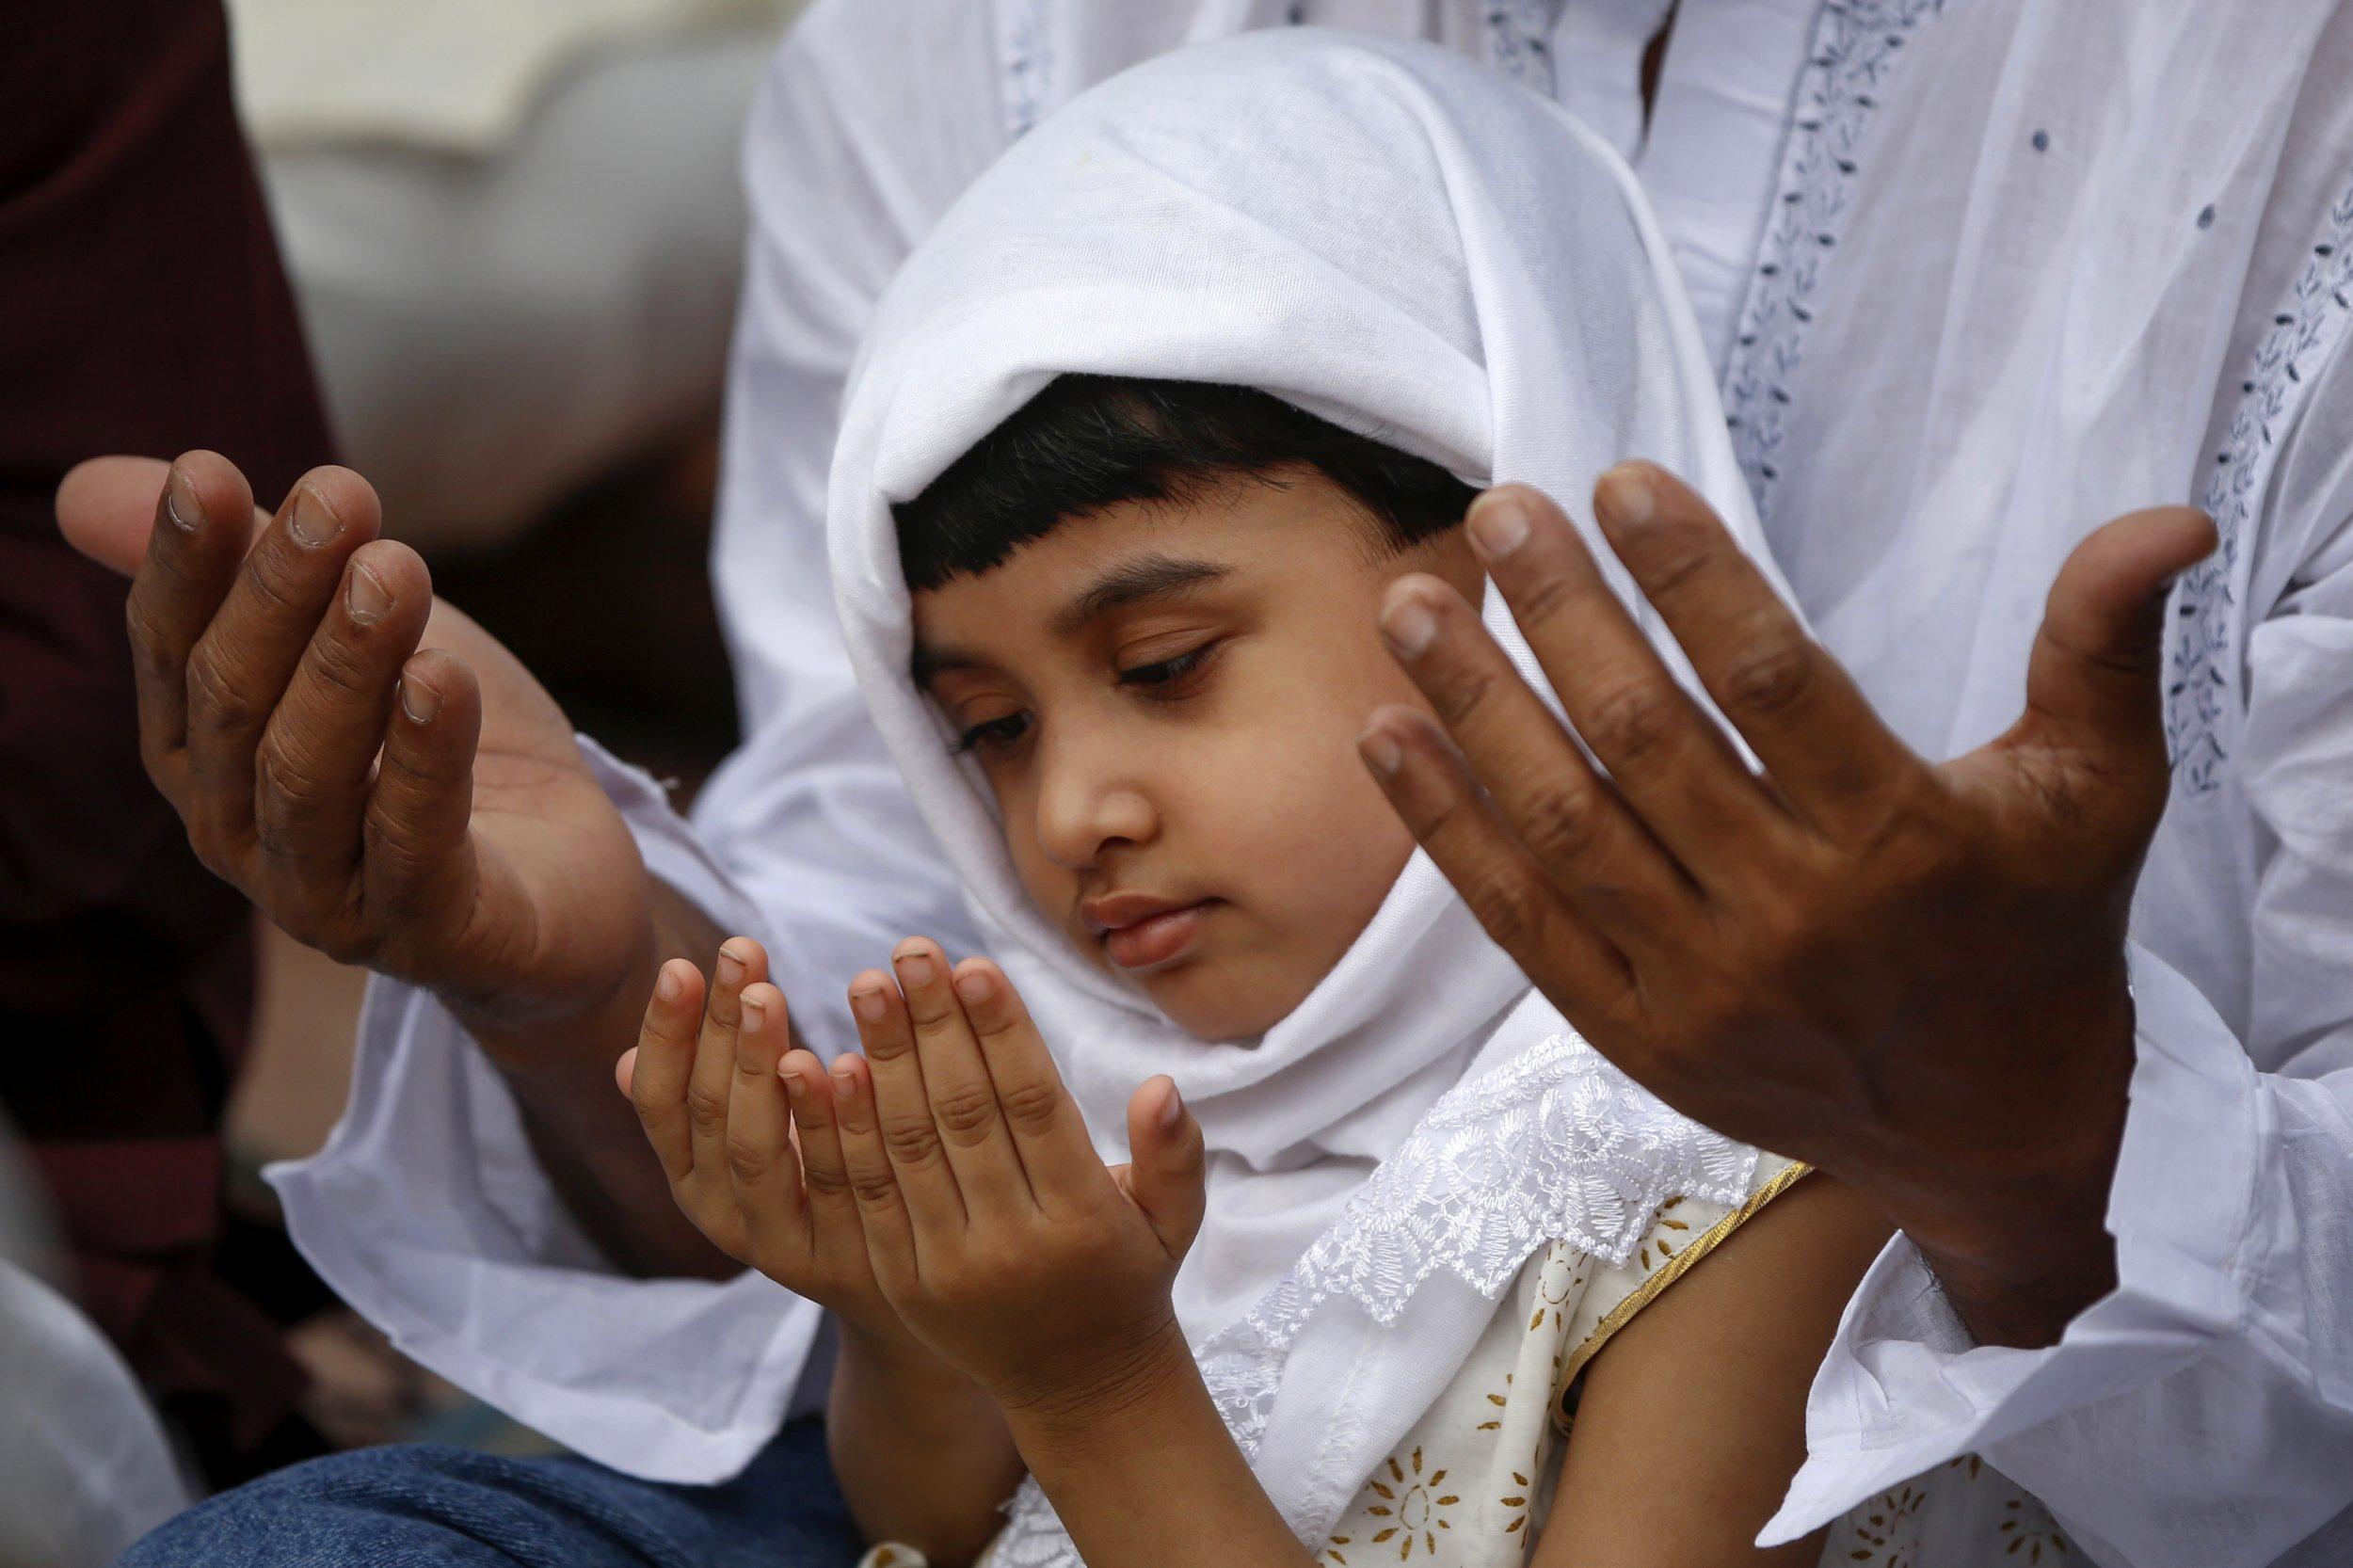 New York City to Add Two Islamic Holidays to Public School Calendar